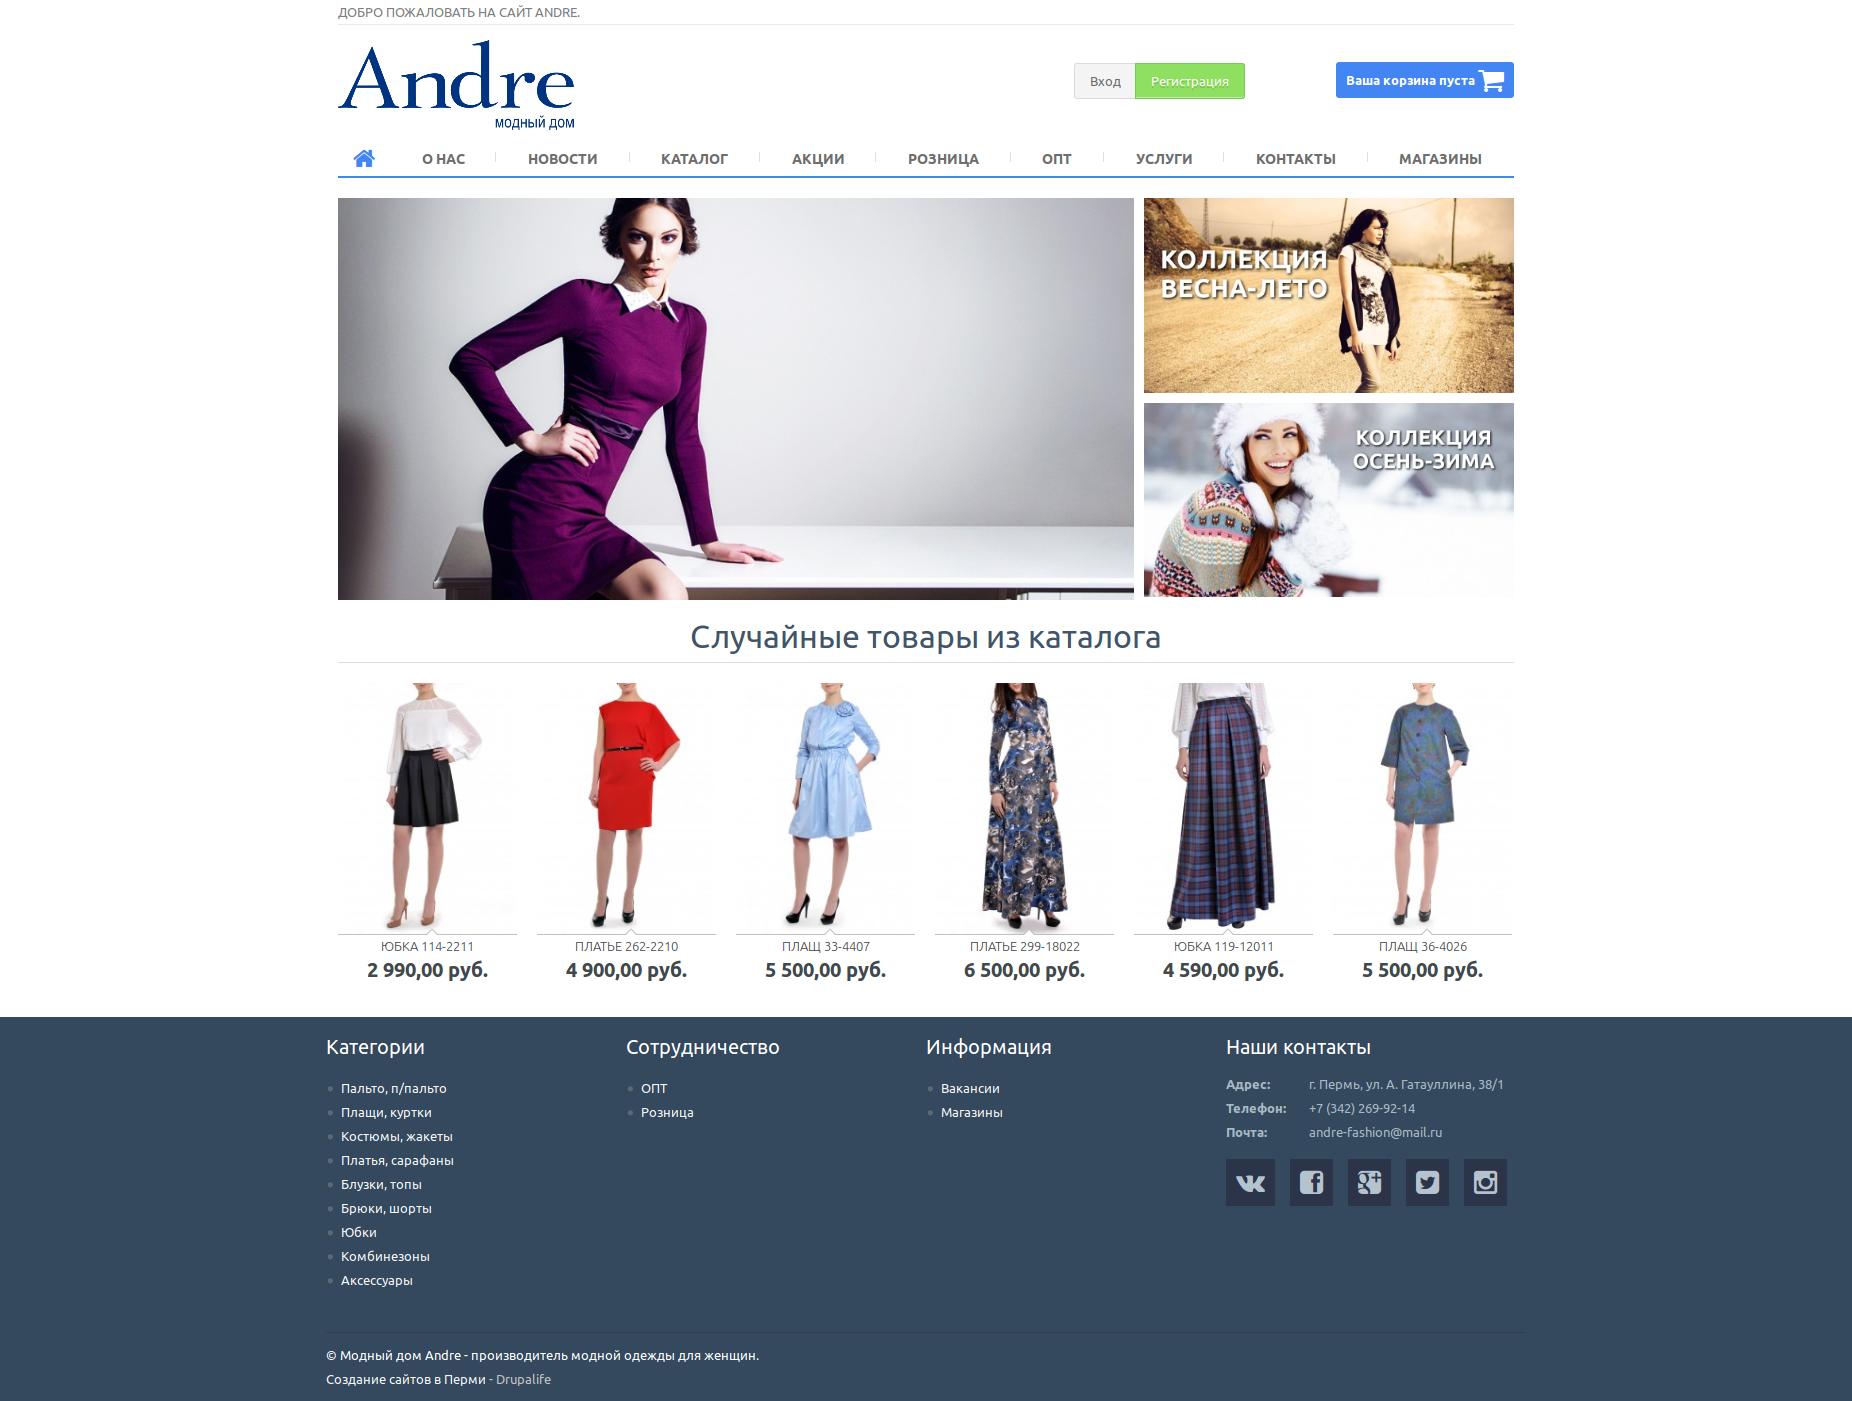 Andre модный дом